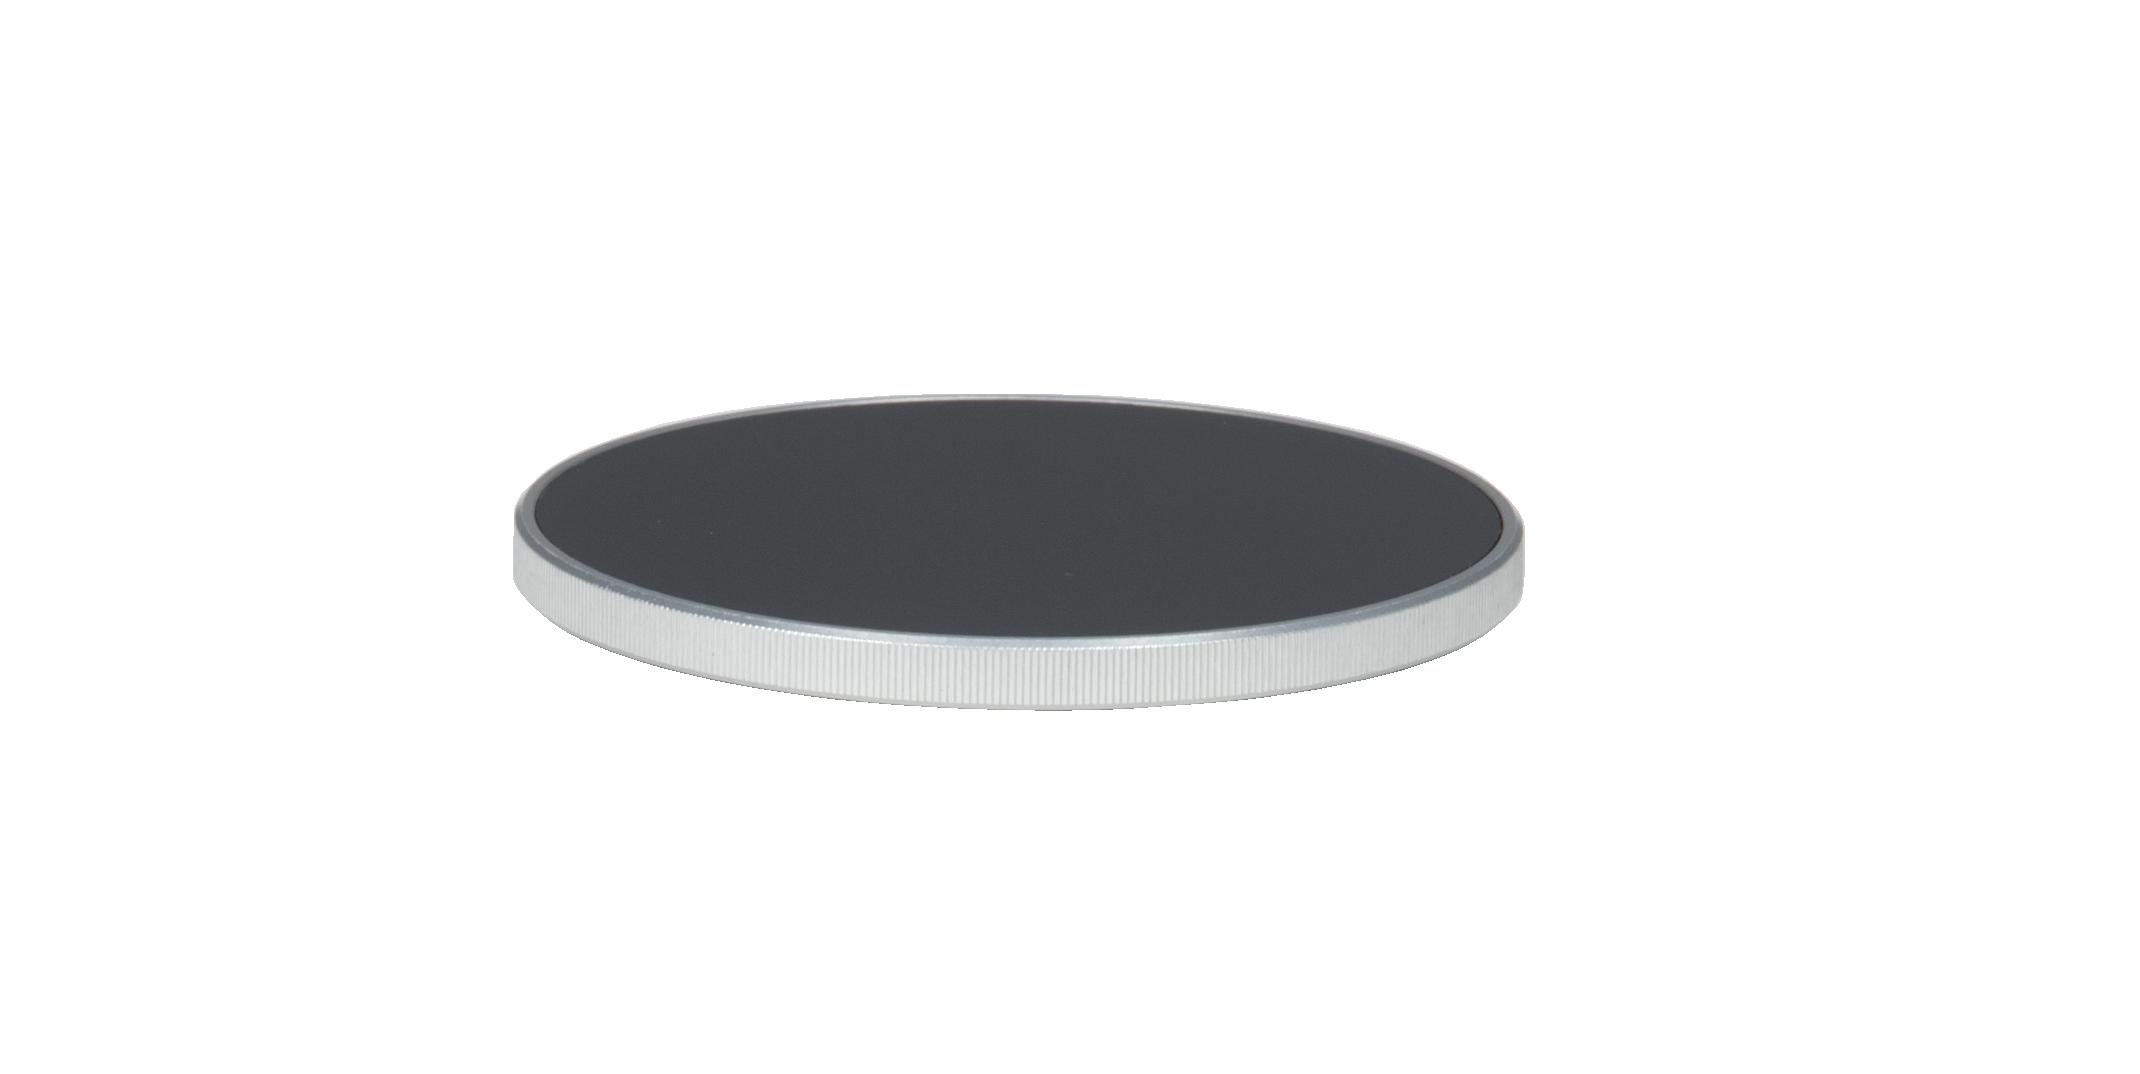 HPG-20 - Matte Black in Silver Metal